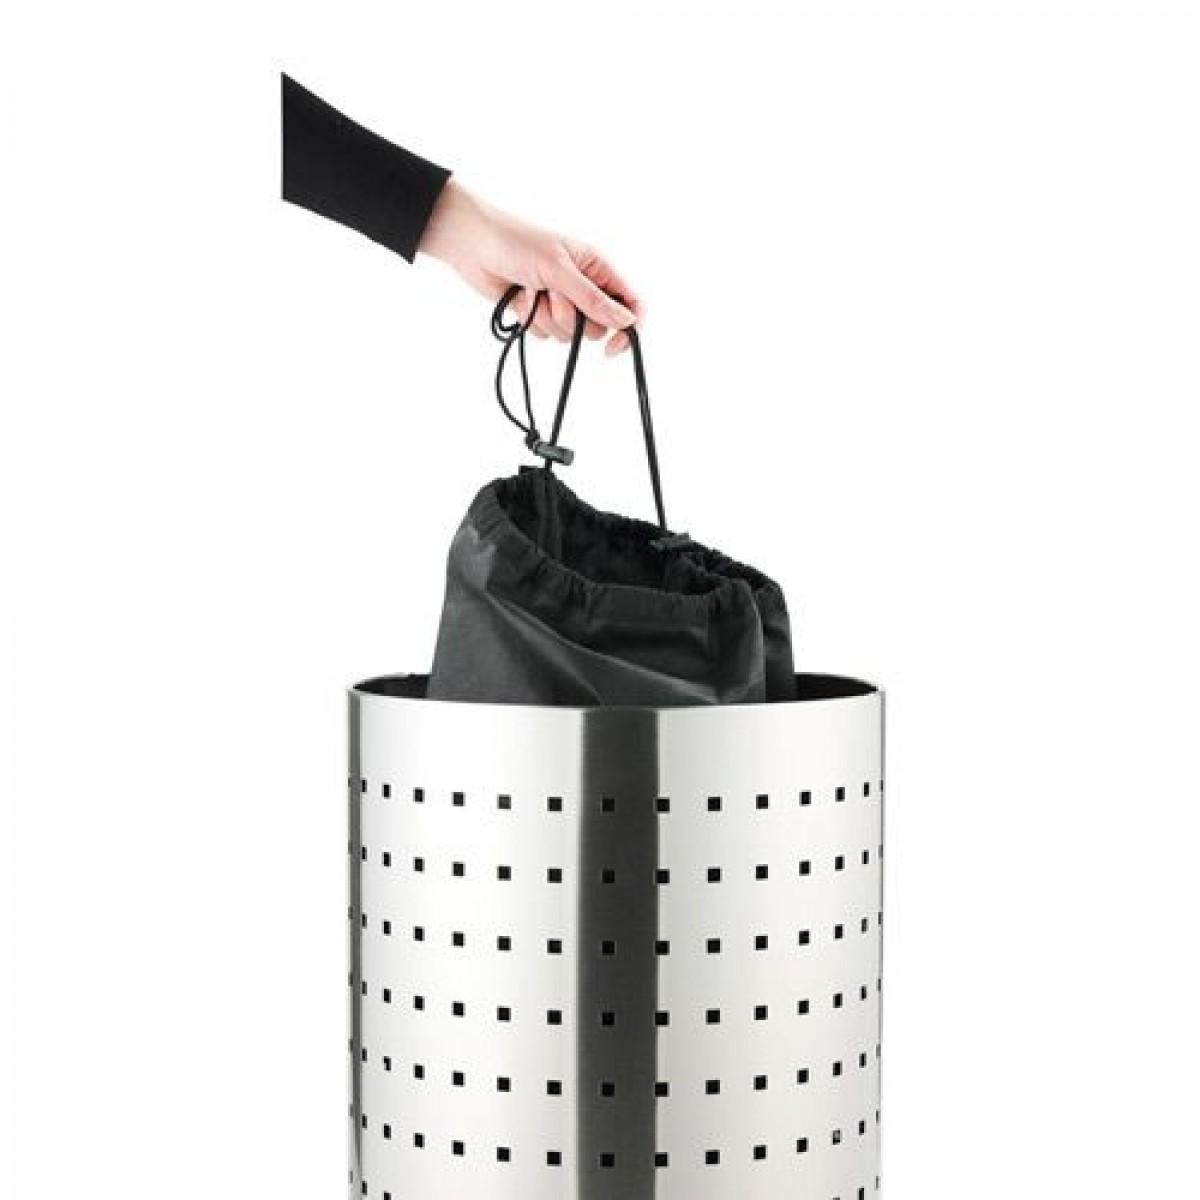 LEIFHEITVasketjspose-01